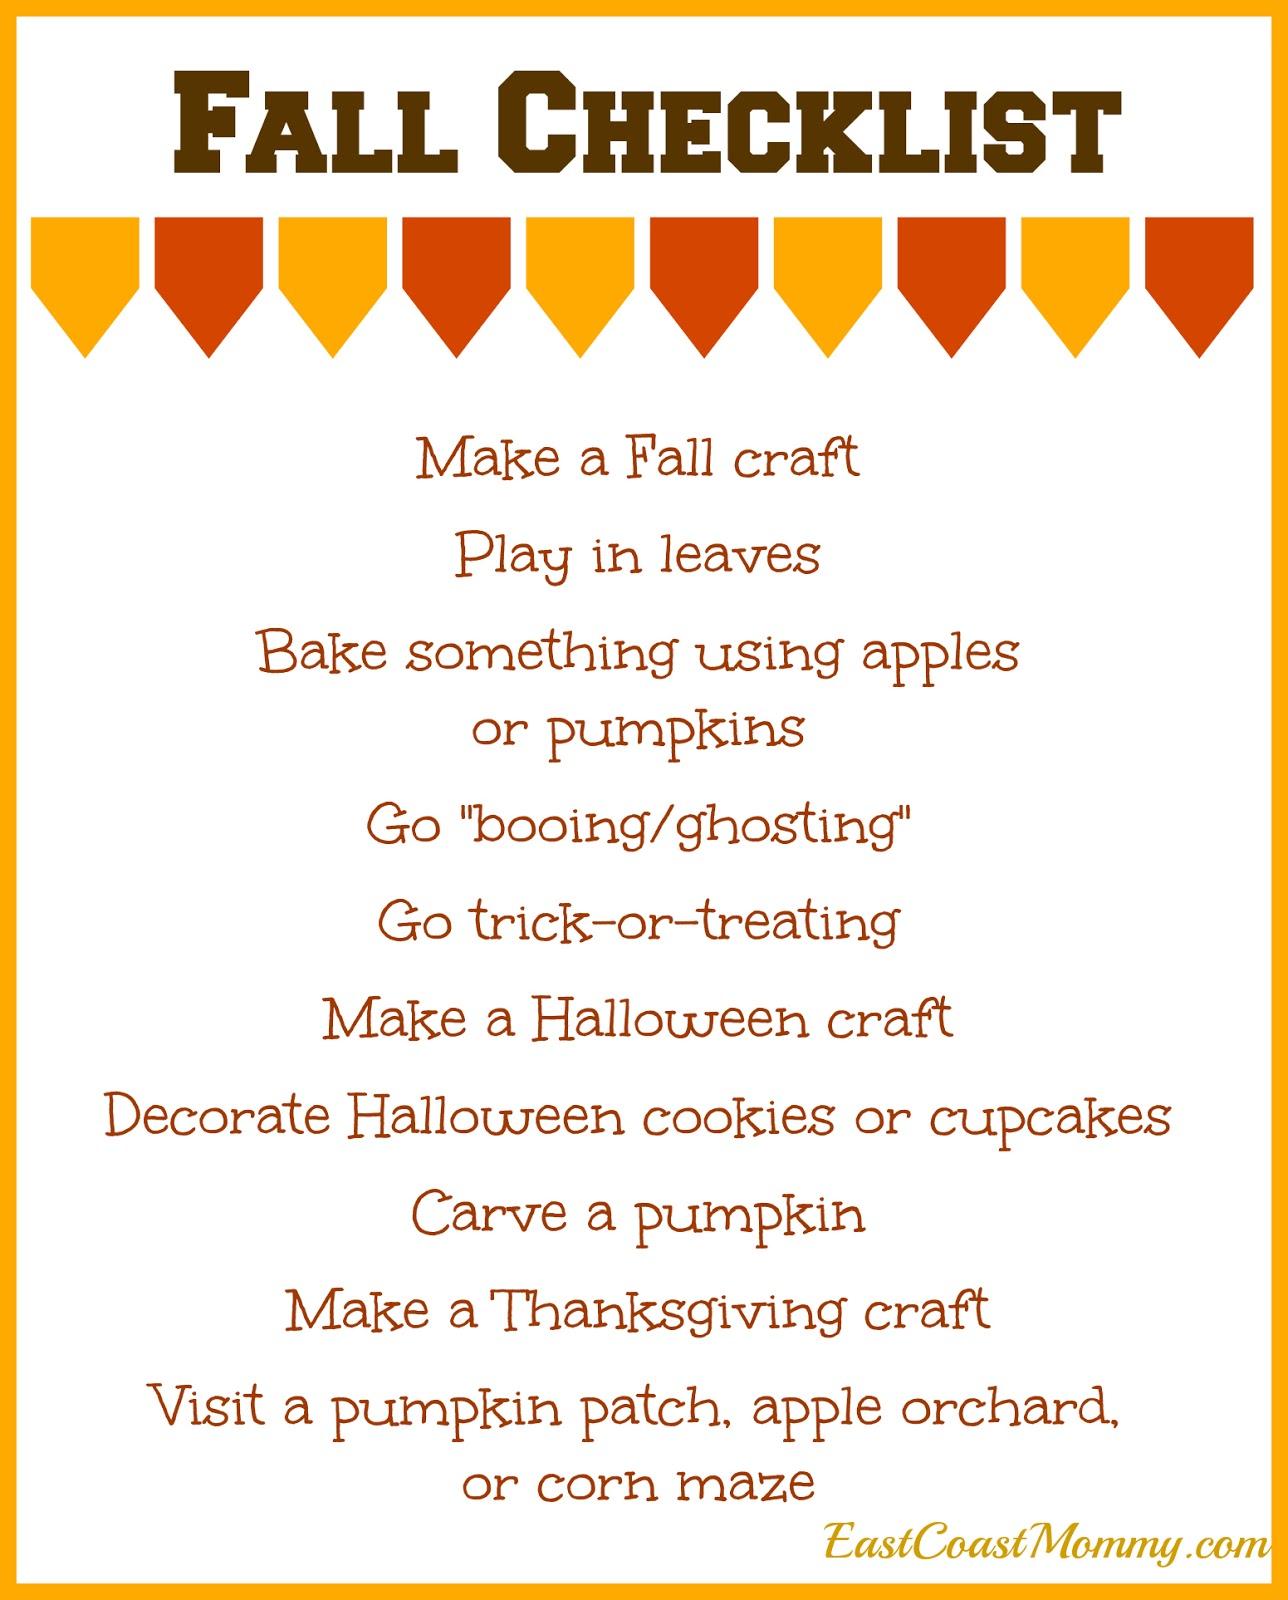 East Coast Mommy Simple Fall Checklist Free Printable